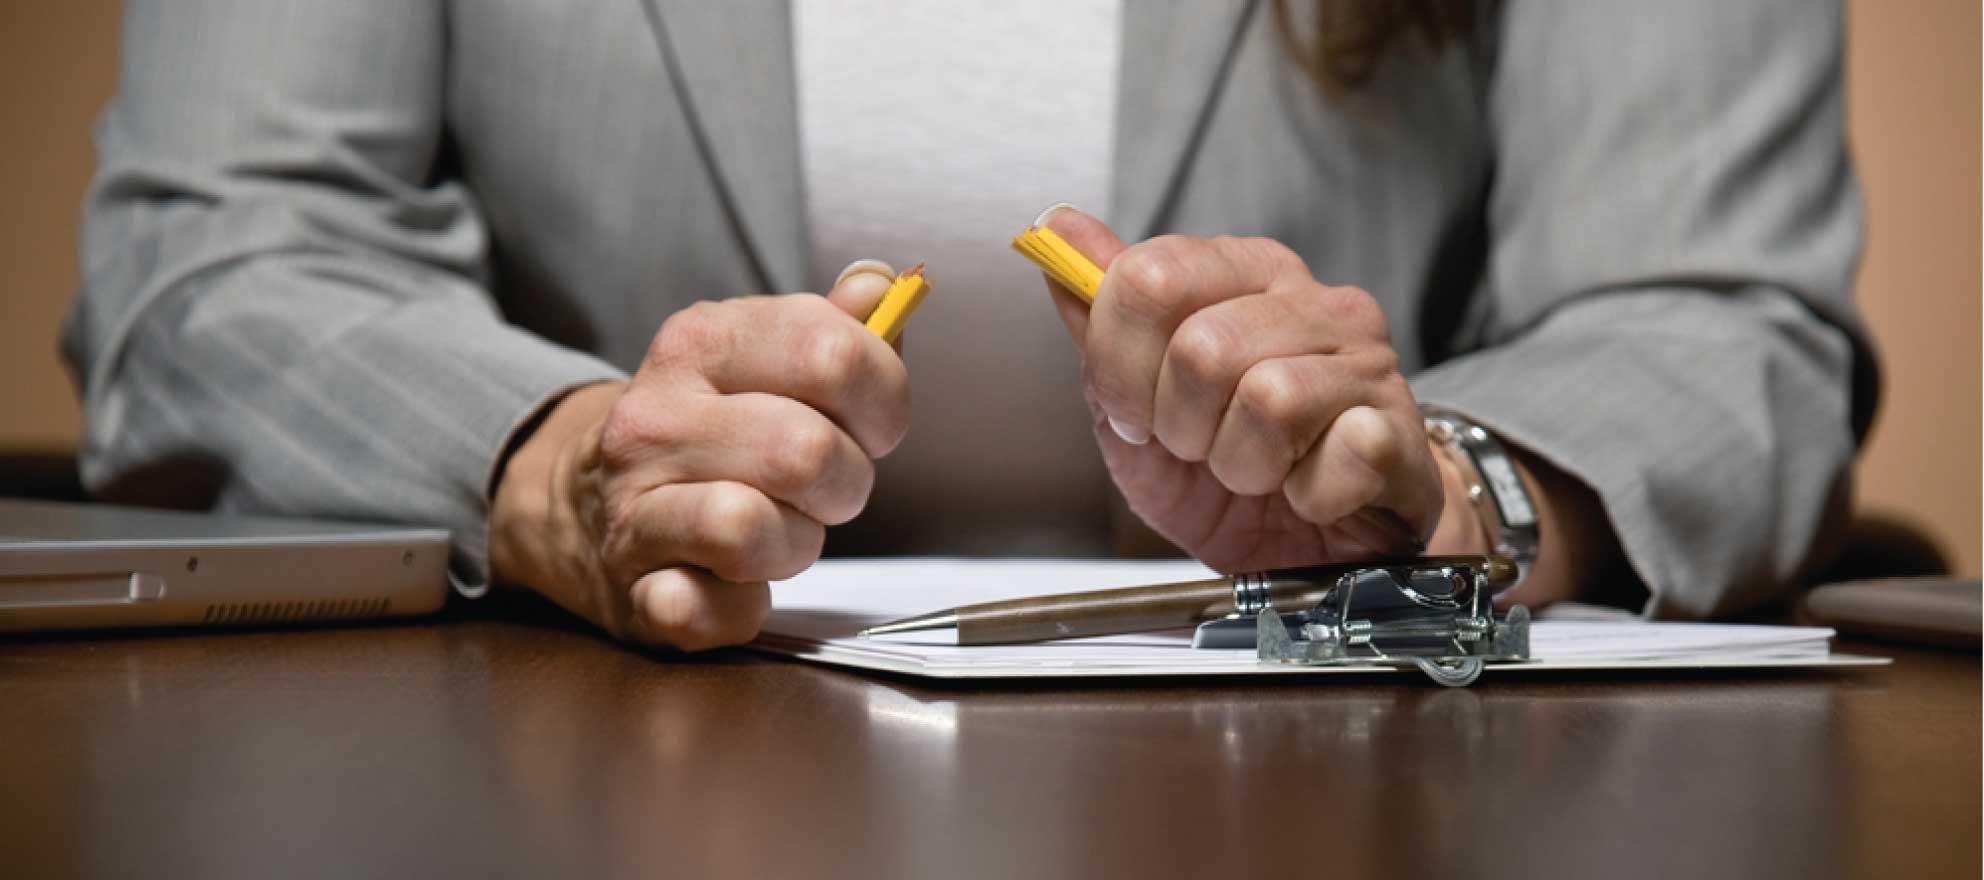 Small associations bristle under NAR mandates